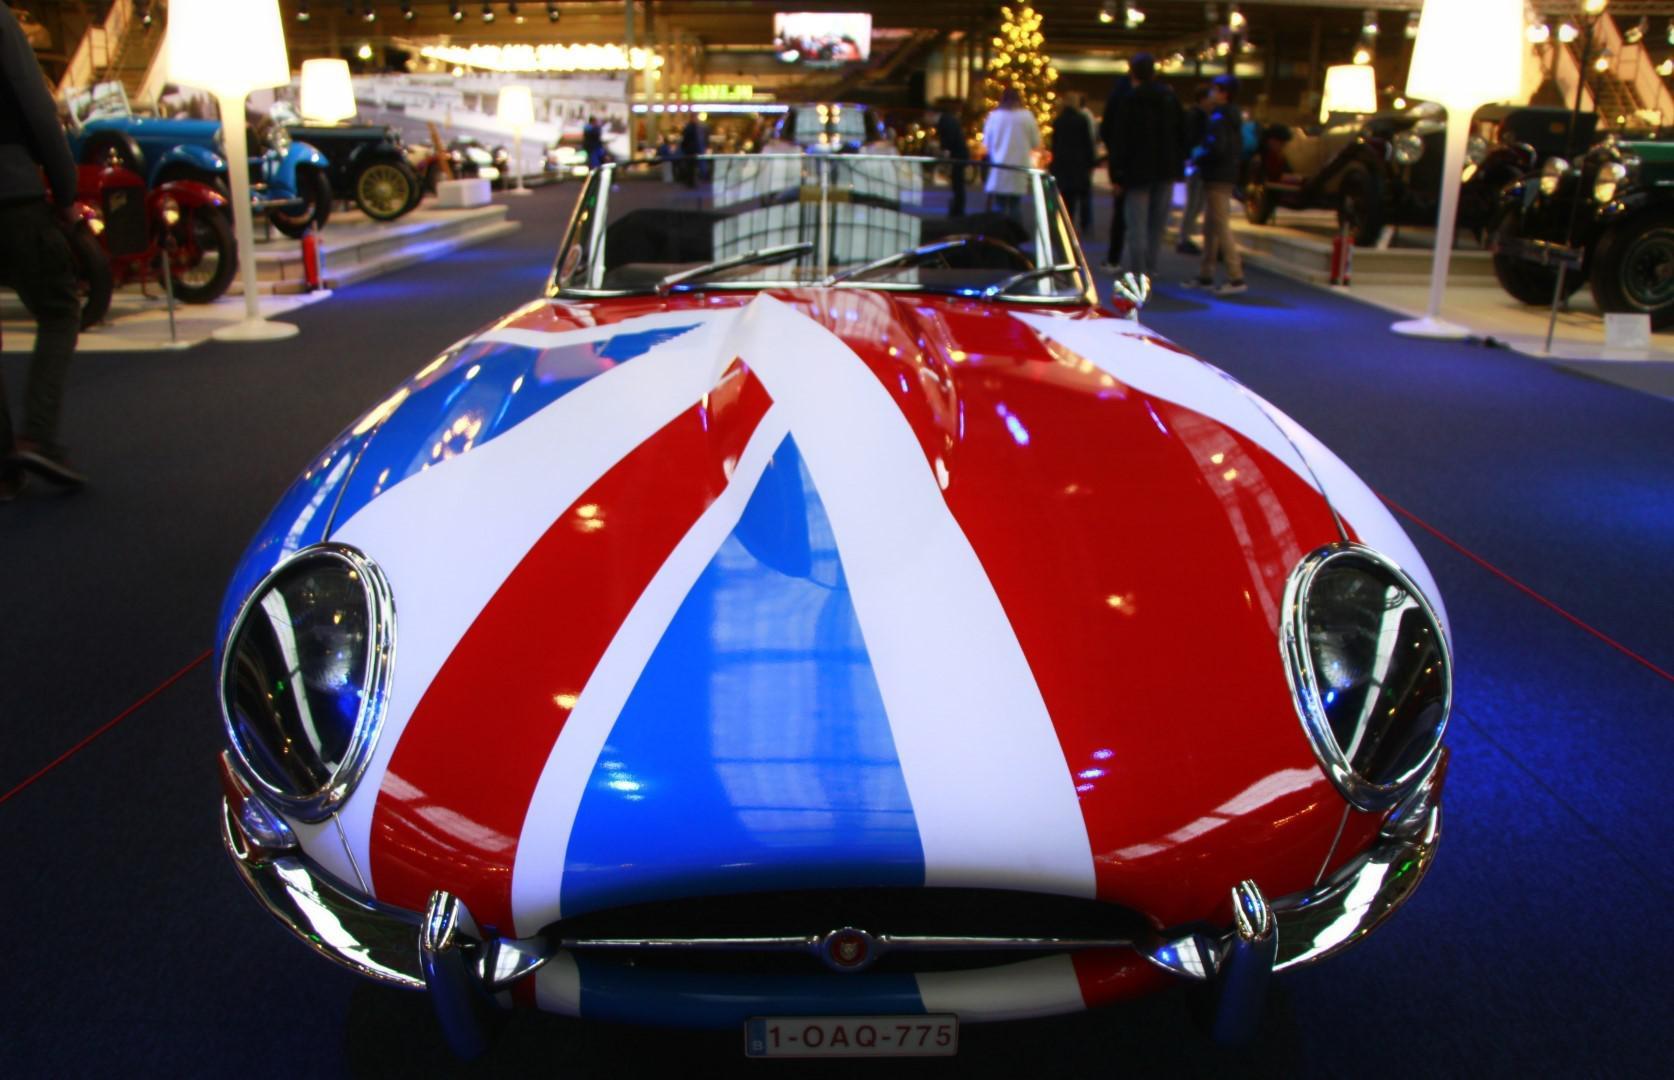 nous-avons-visite-so-british-cars-amp-lifestyle-1179-1.jpeg